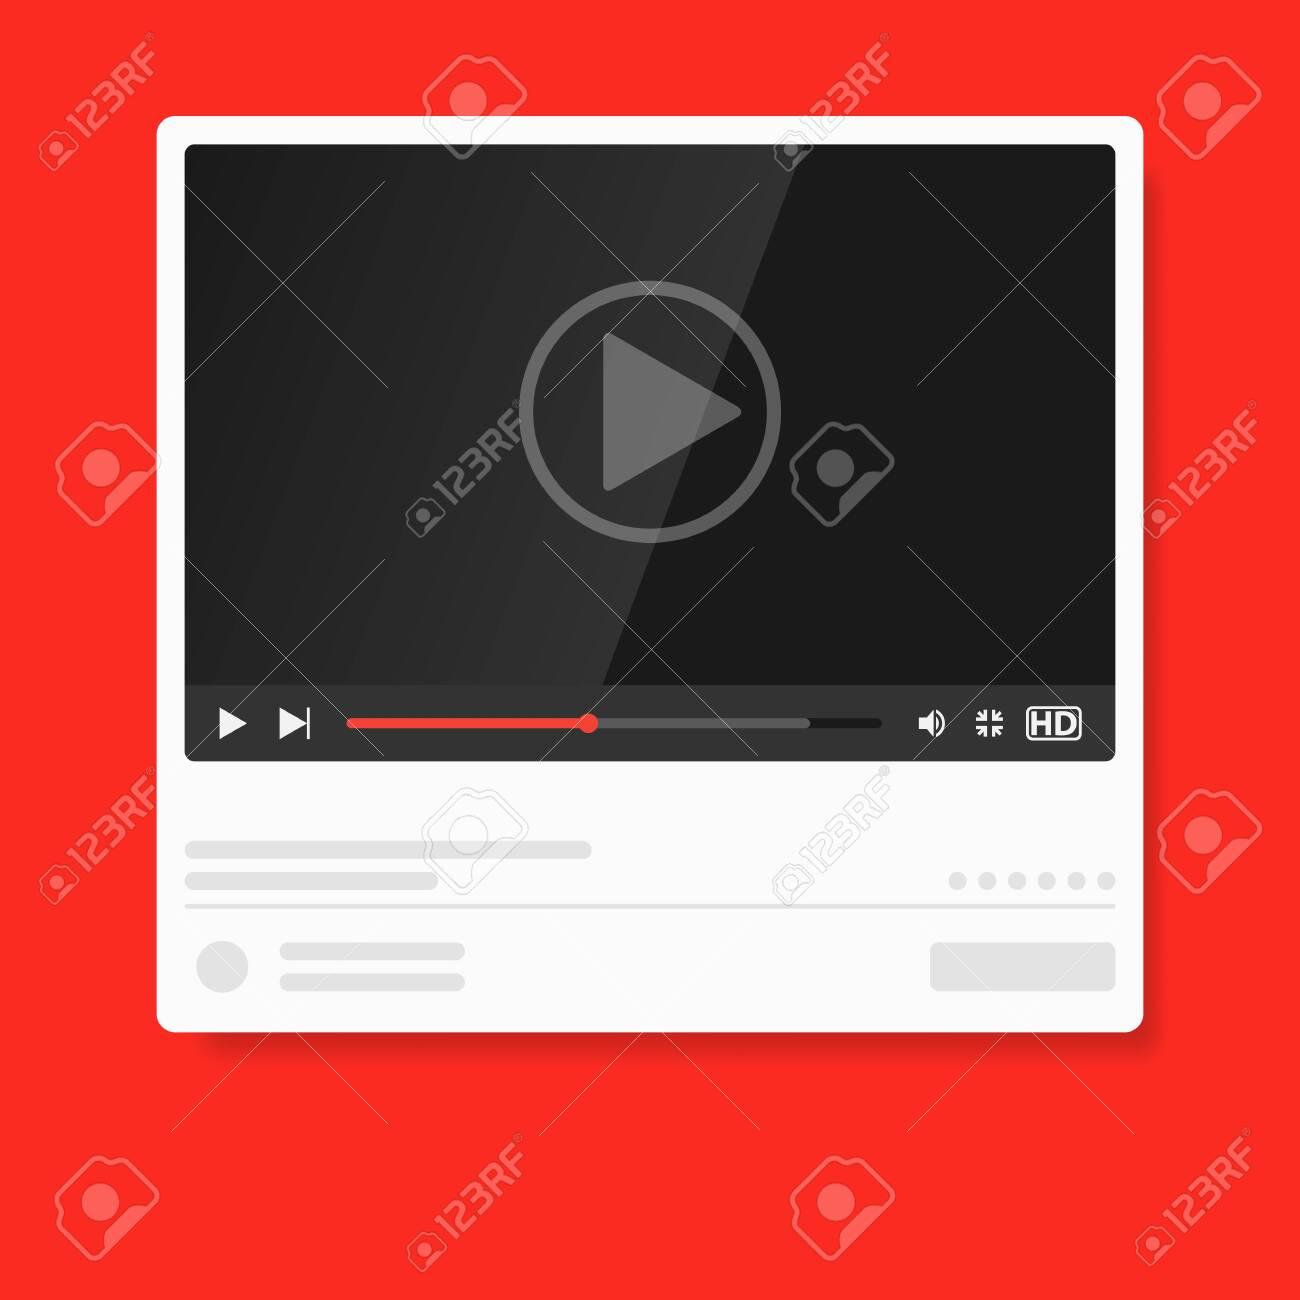 Modern Video Player Design Template Media Player Window Bar